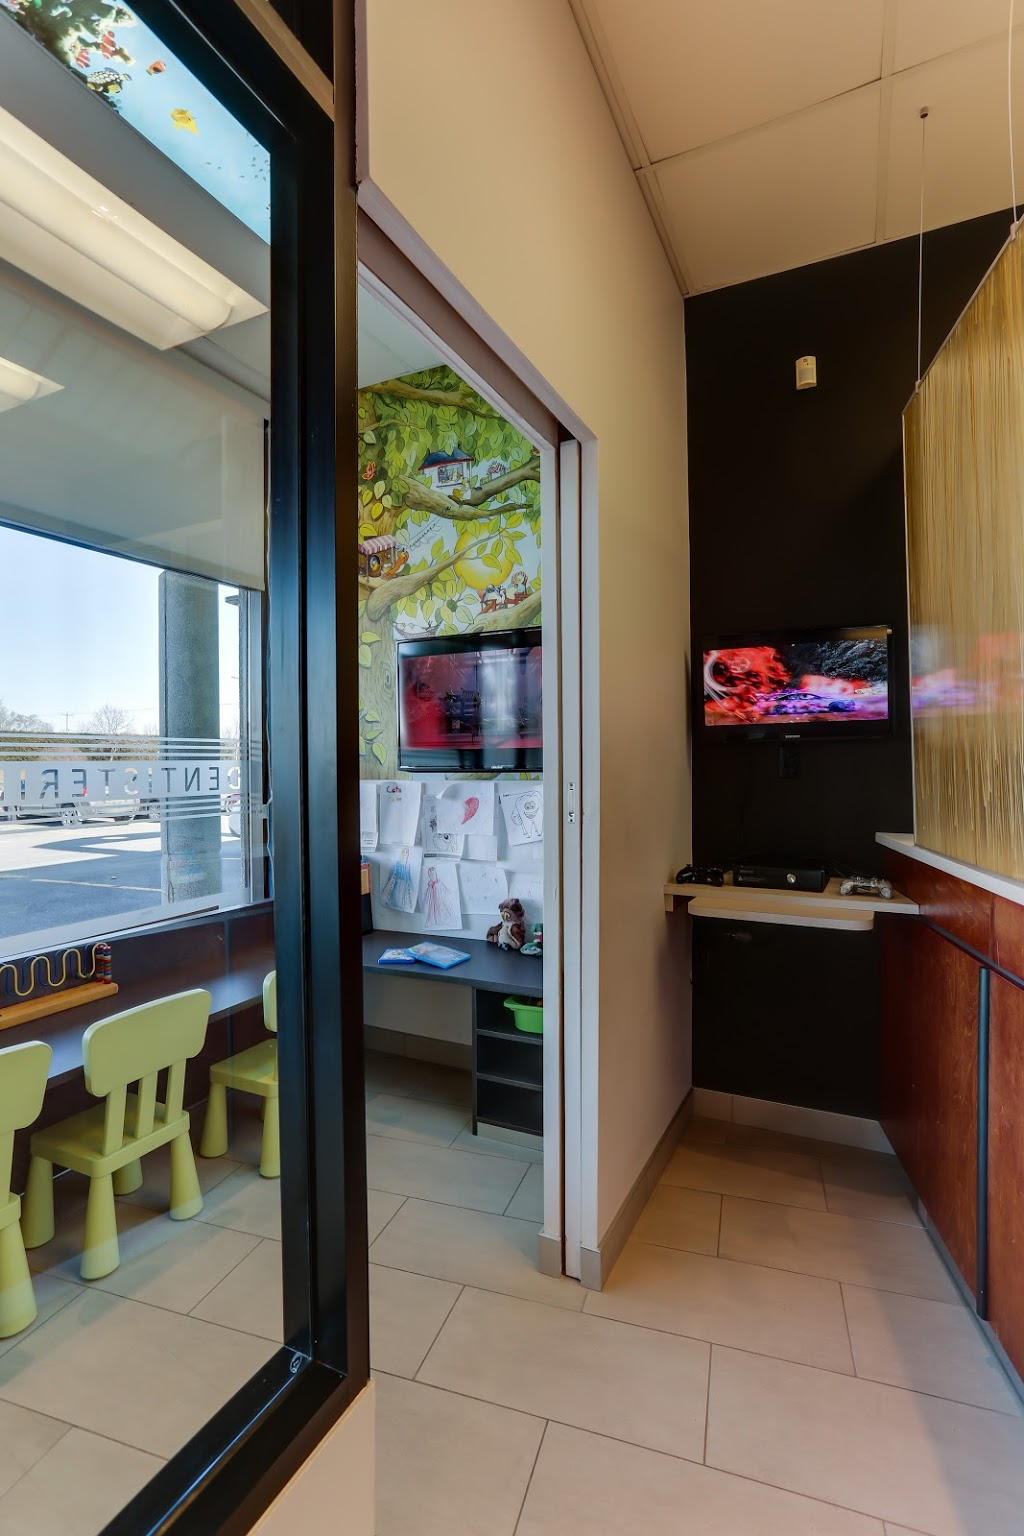 Centre Dentaire Thimens | dentist | 1924 Boulevard Thimens, Saint-Laurent, QC H4R 2K2, Canada | 5143337222 OR +1 514-333-7222